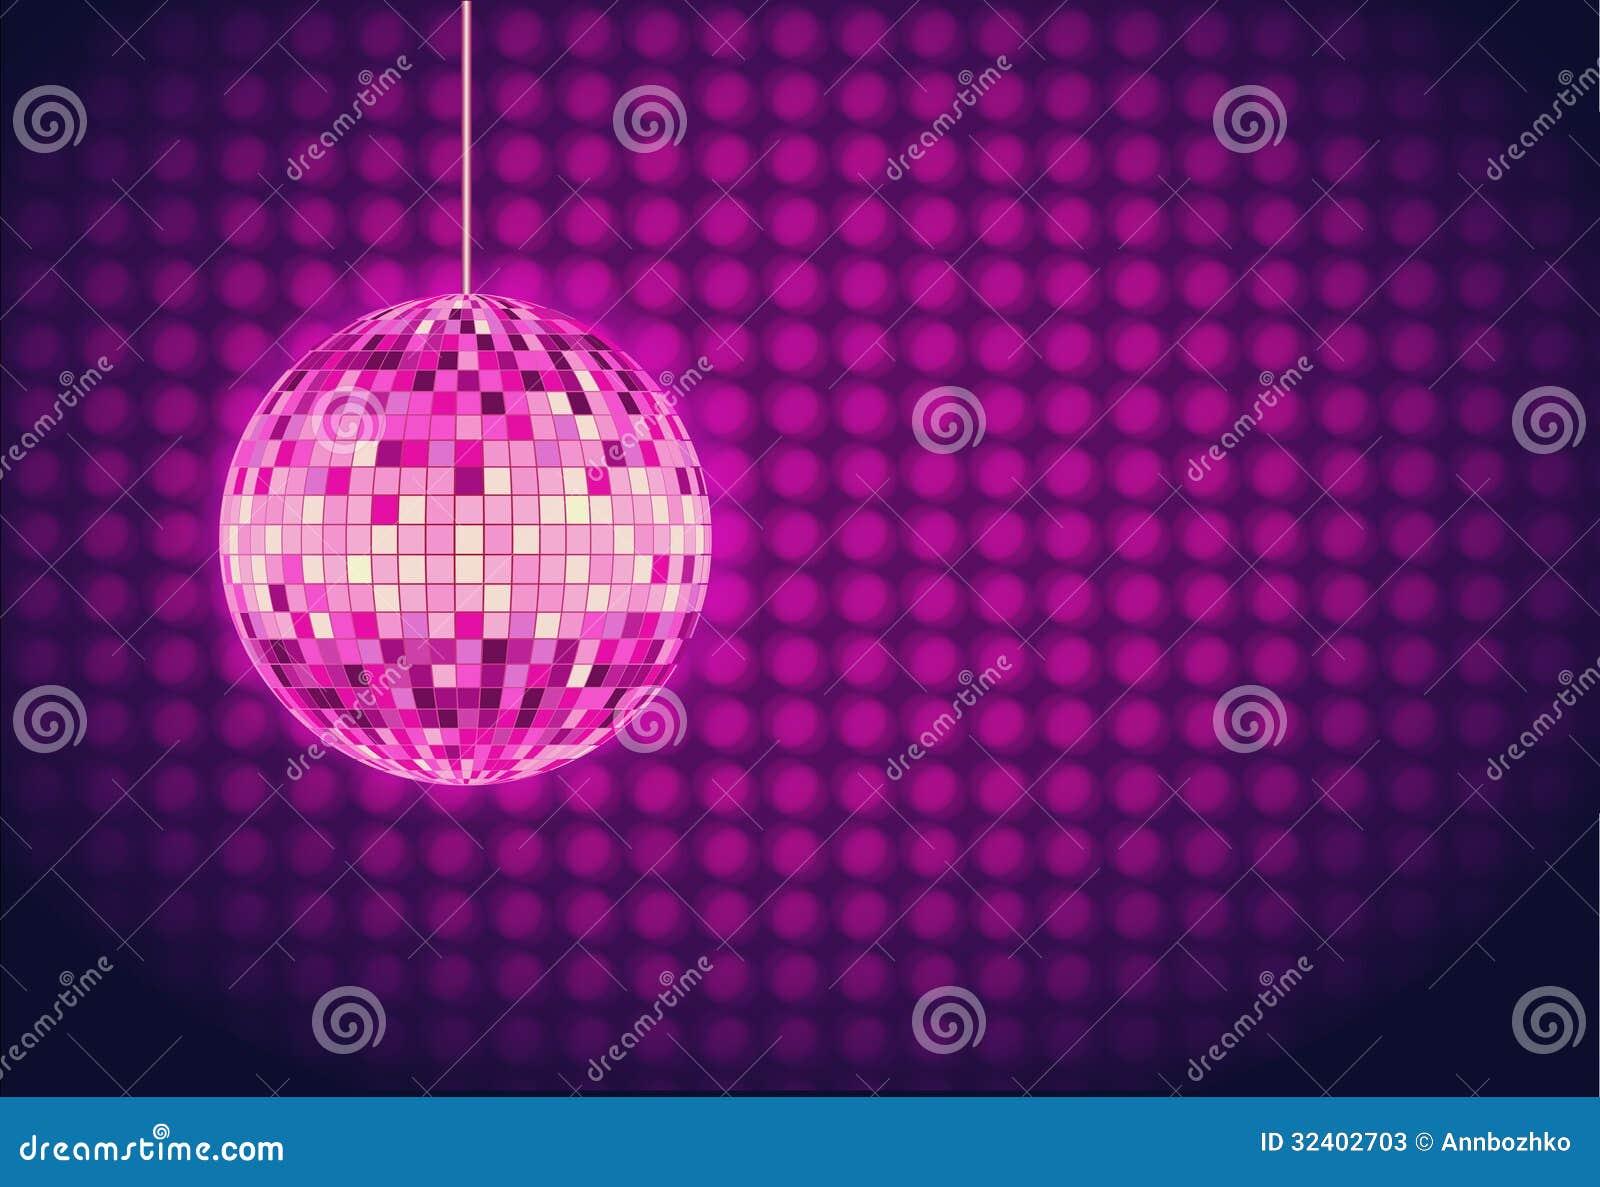 Bola de discoteca fondo del disco fotos de archivo - Bola de discoteca de colores ...